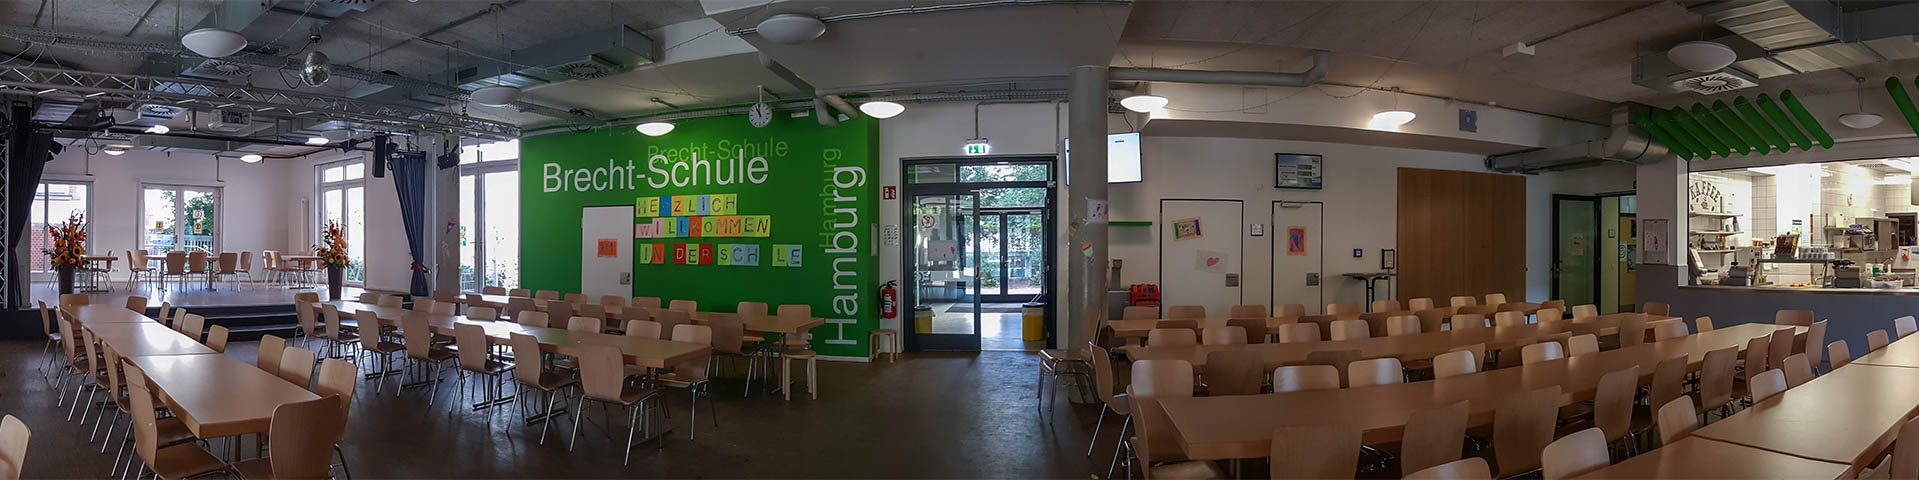 Aula der Brecht-Schule